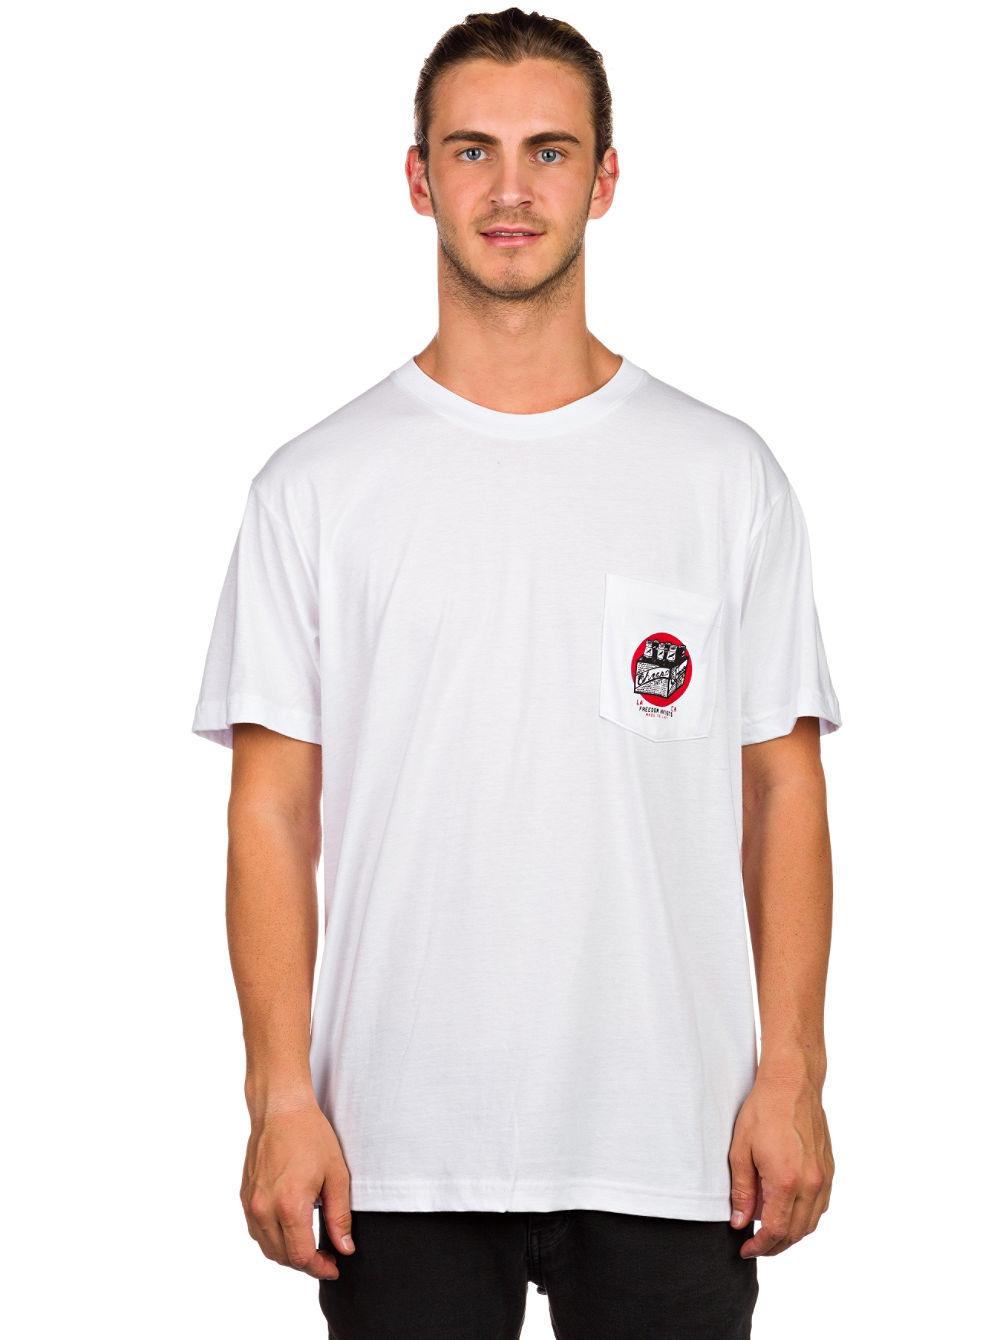 freedom-artists-cheap-date-pocket-t-shirt